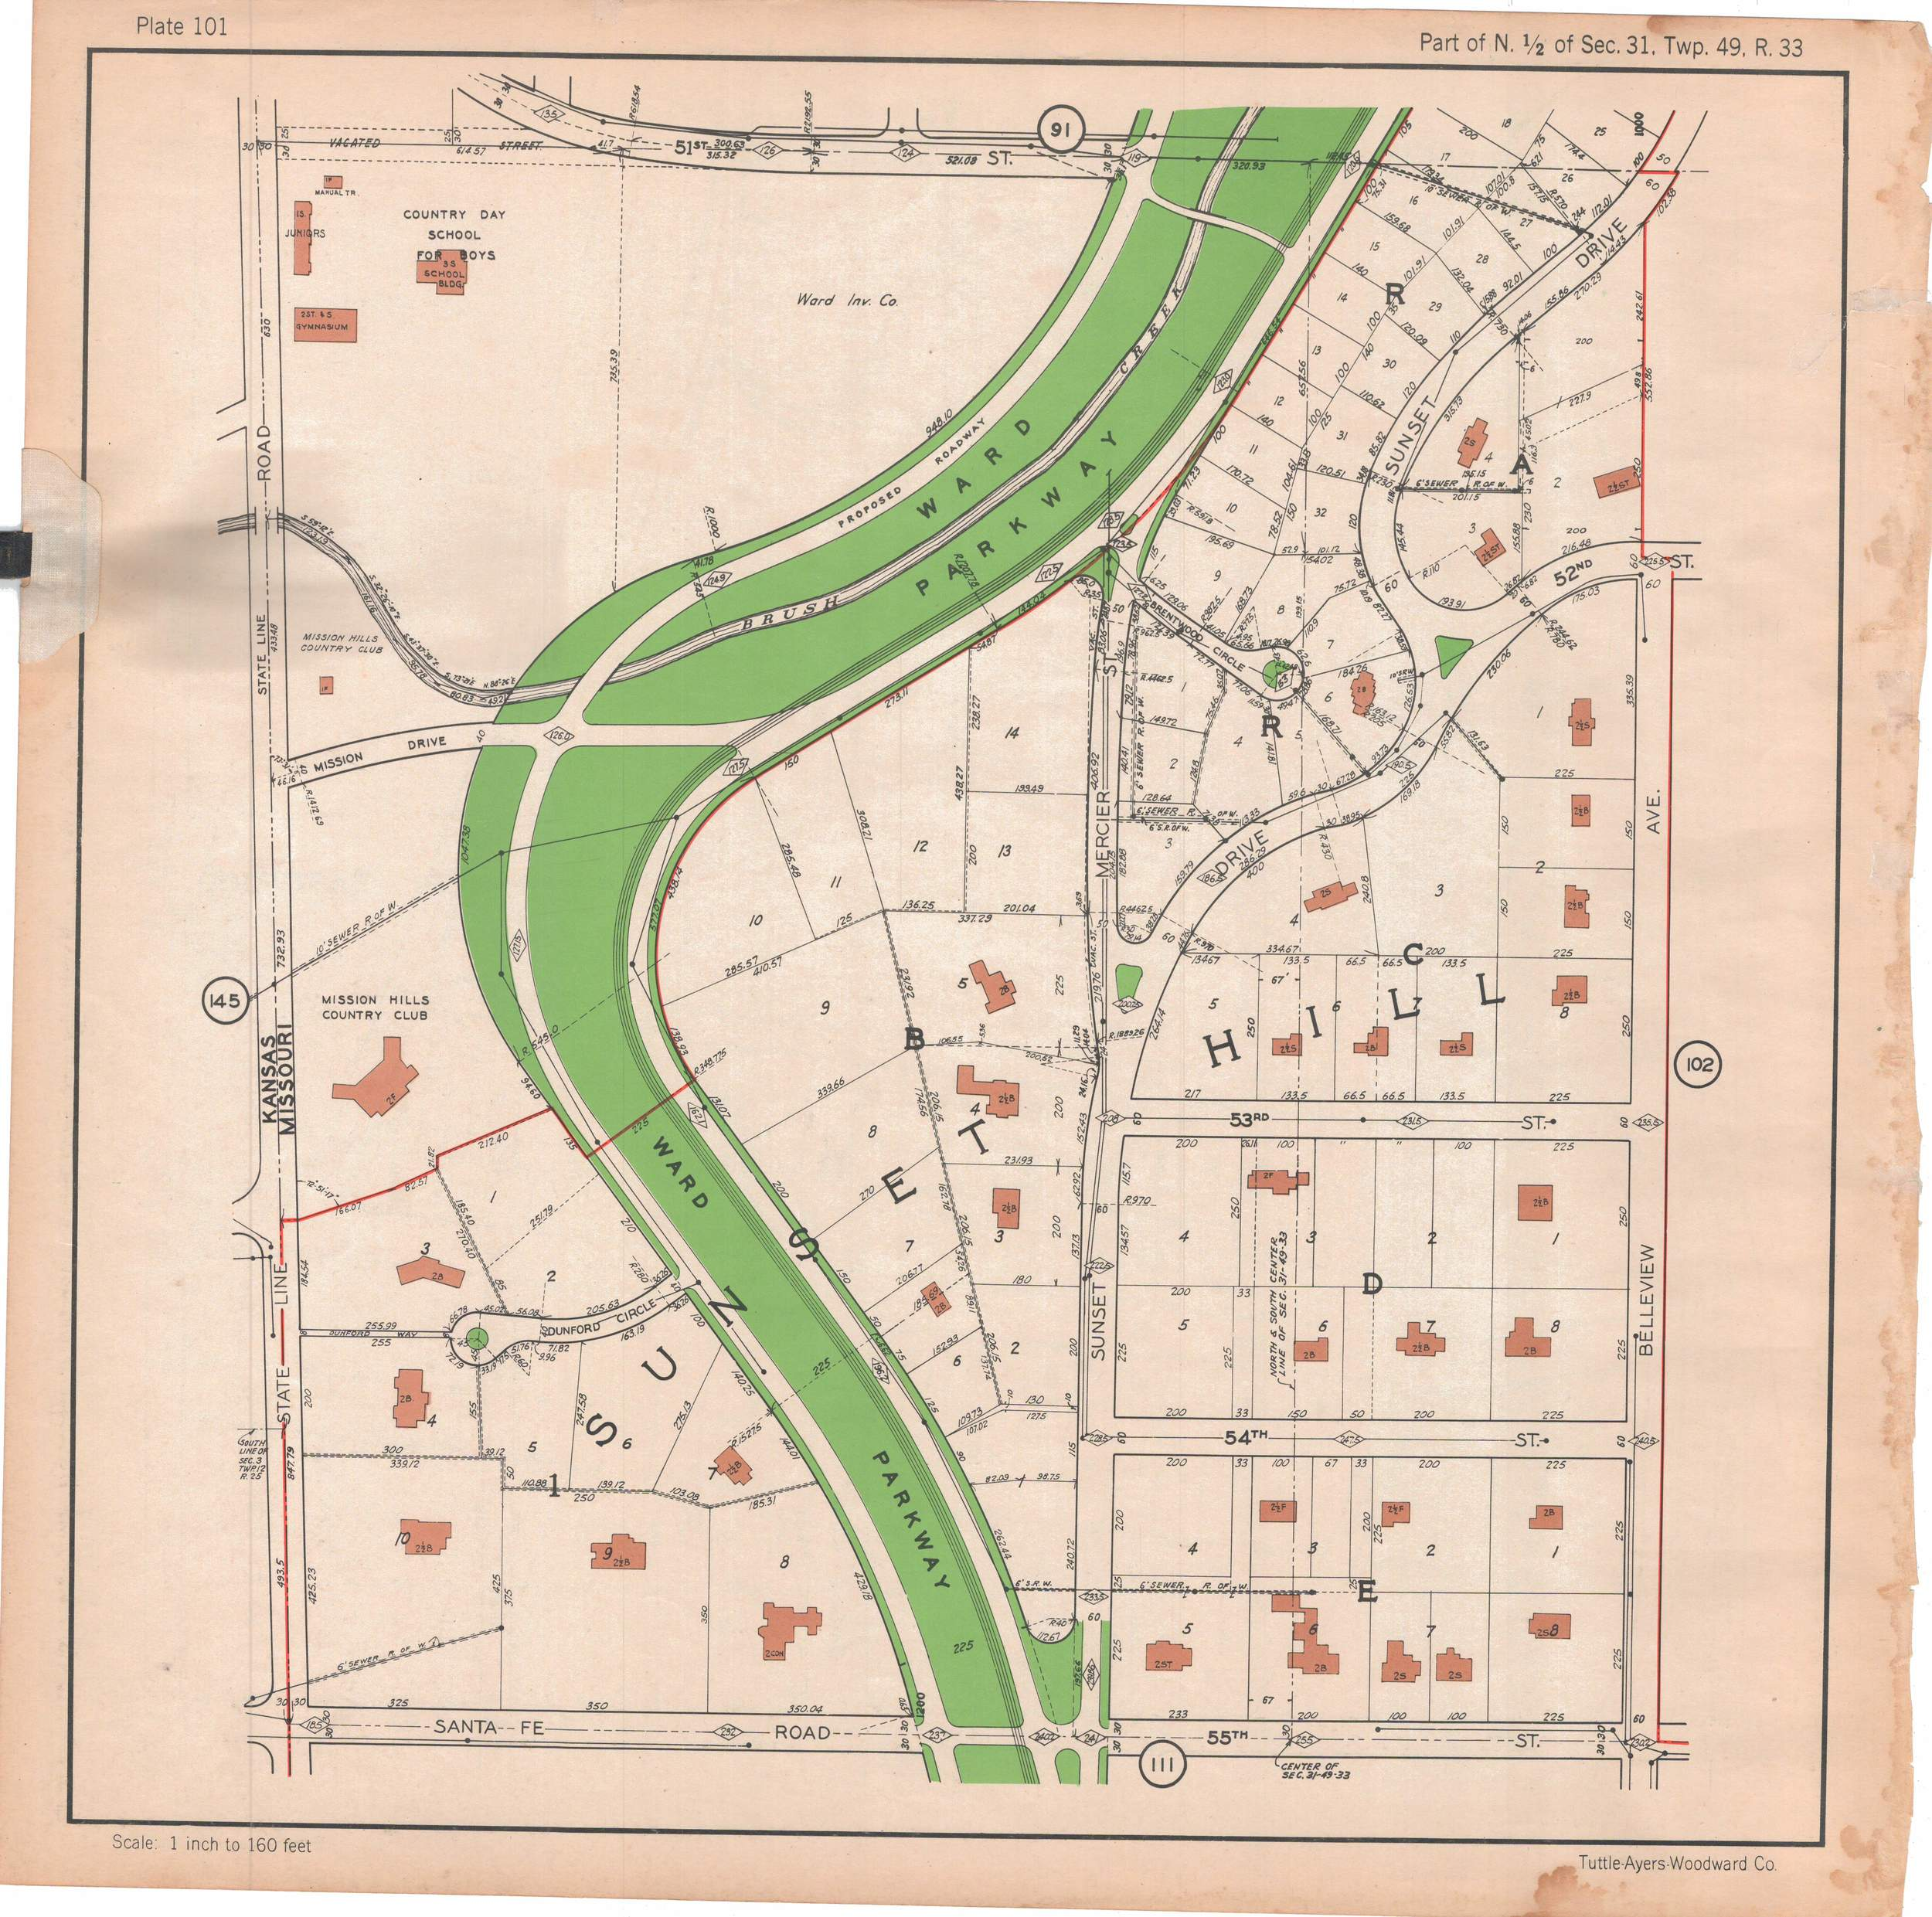 1925 TUTTLE_AYERS_Plate 101.JPG